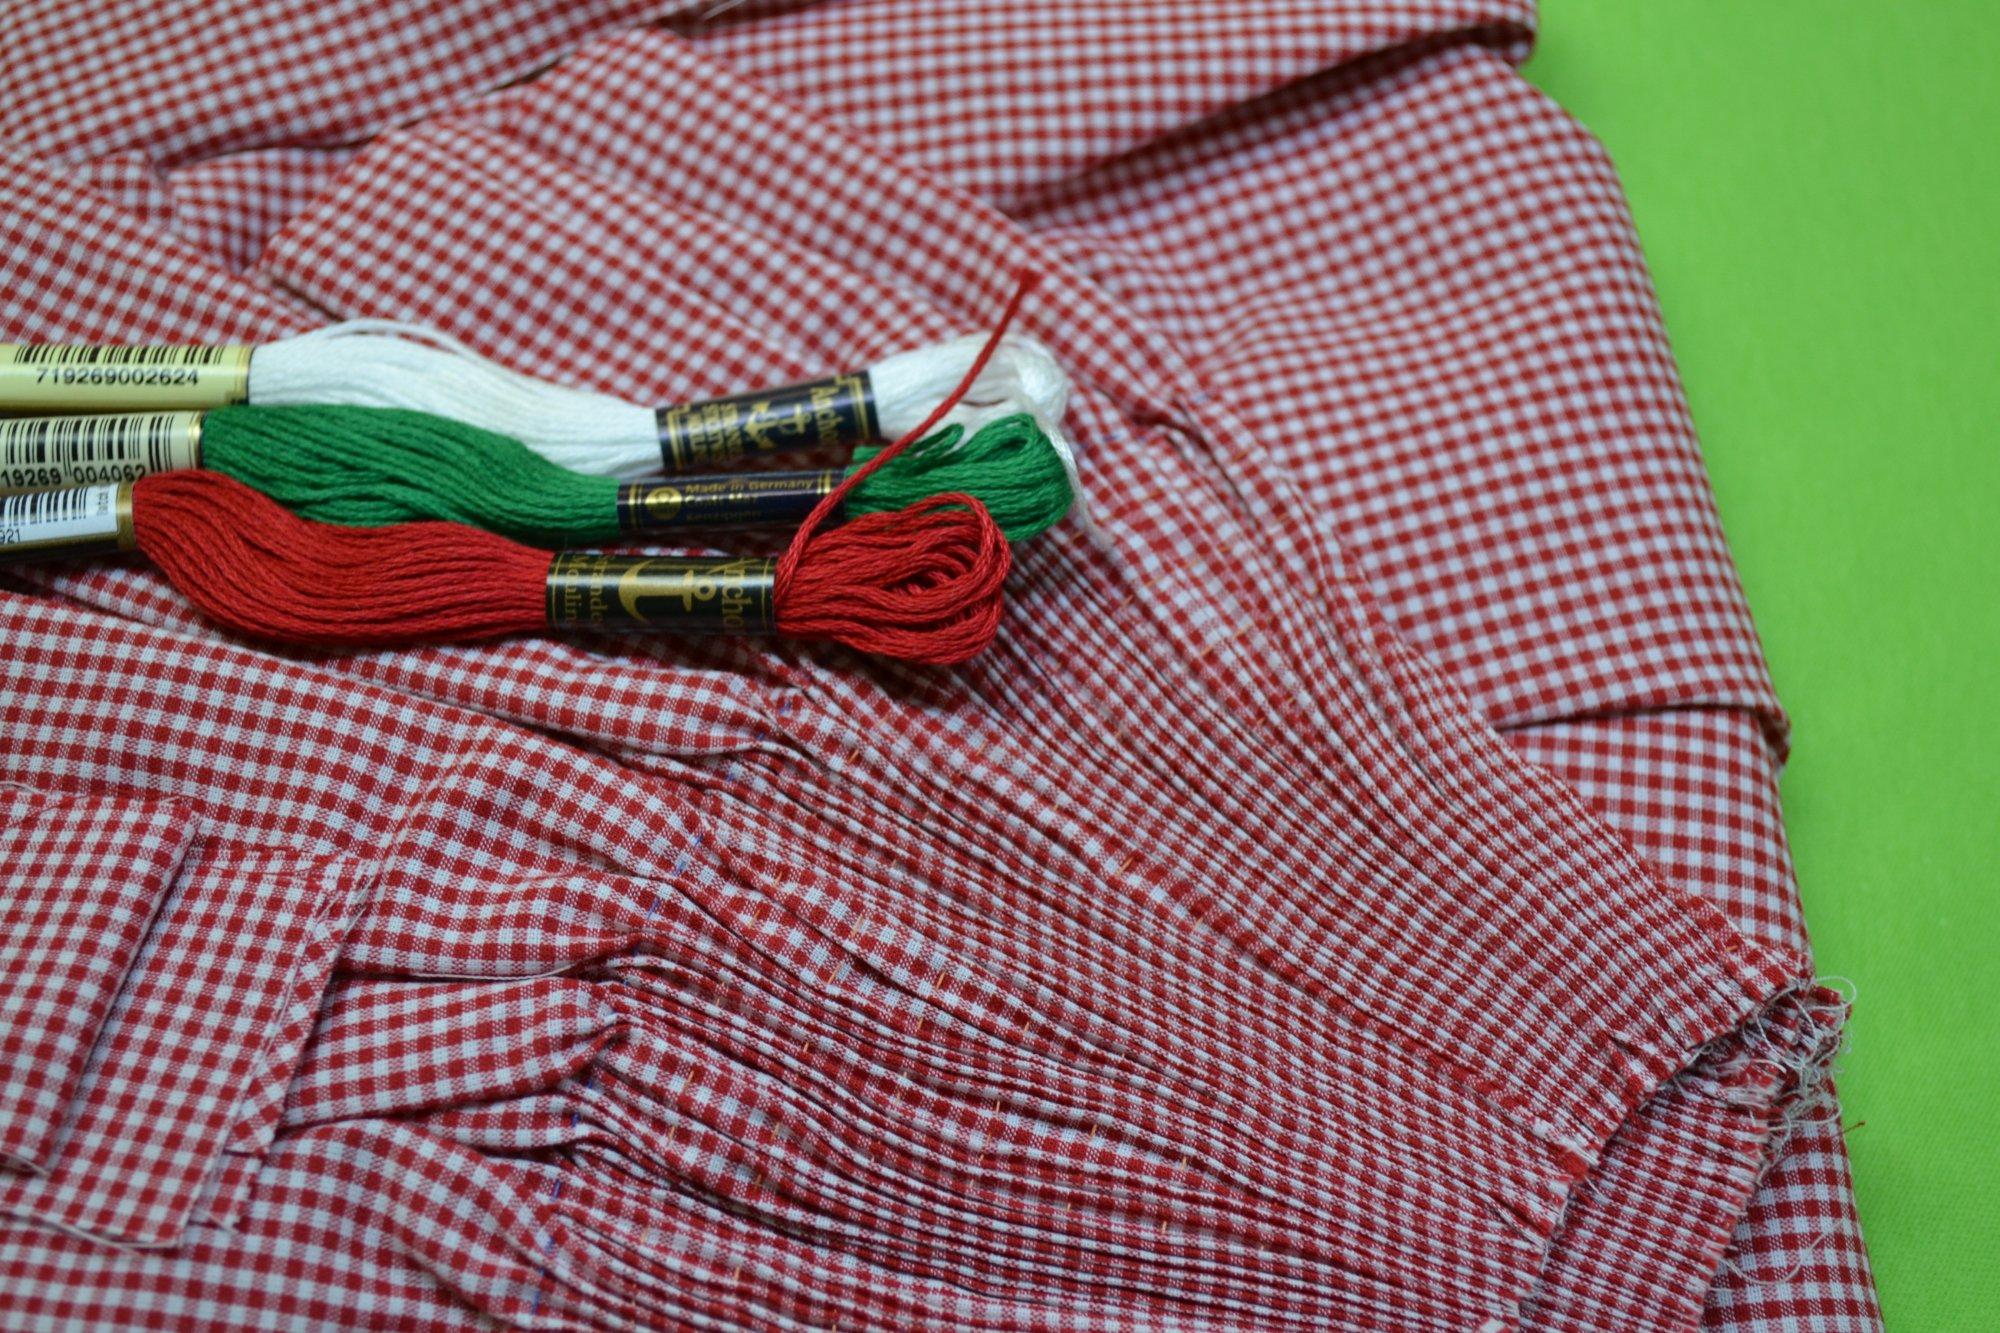 Bishop Kit - Banded Sleeve Red Gingham 4 years